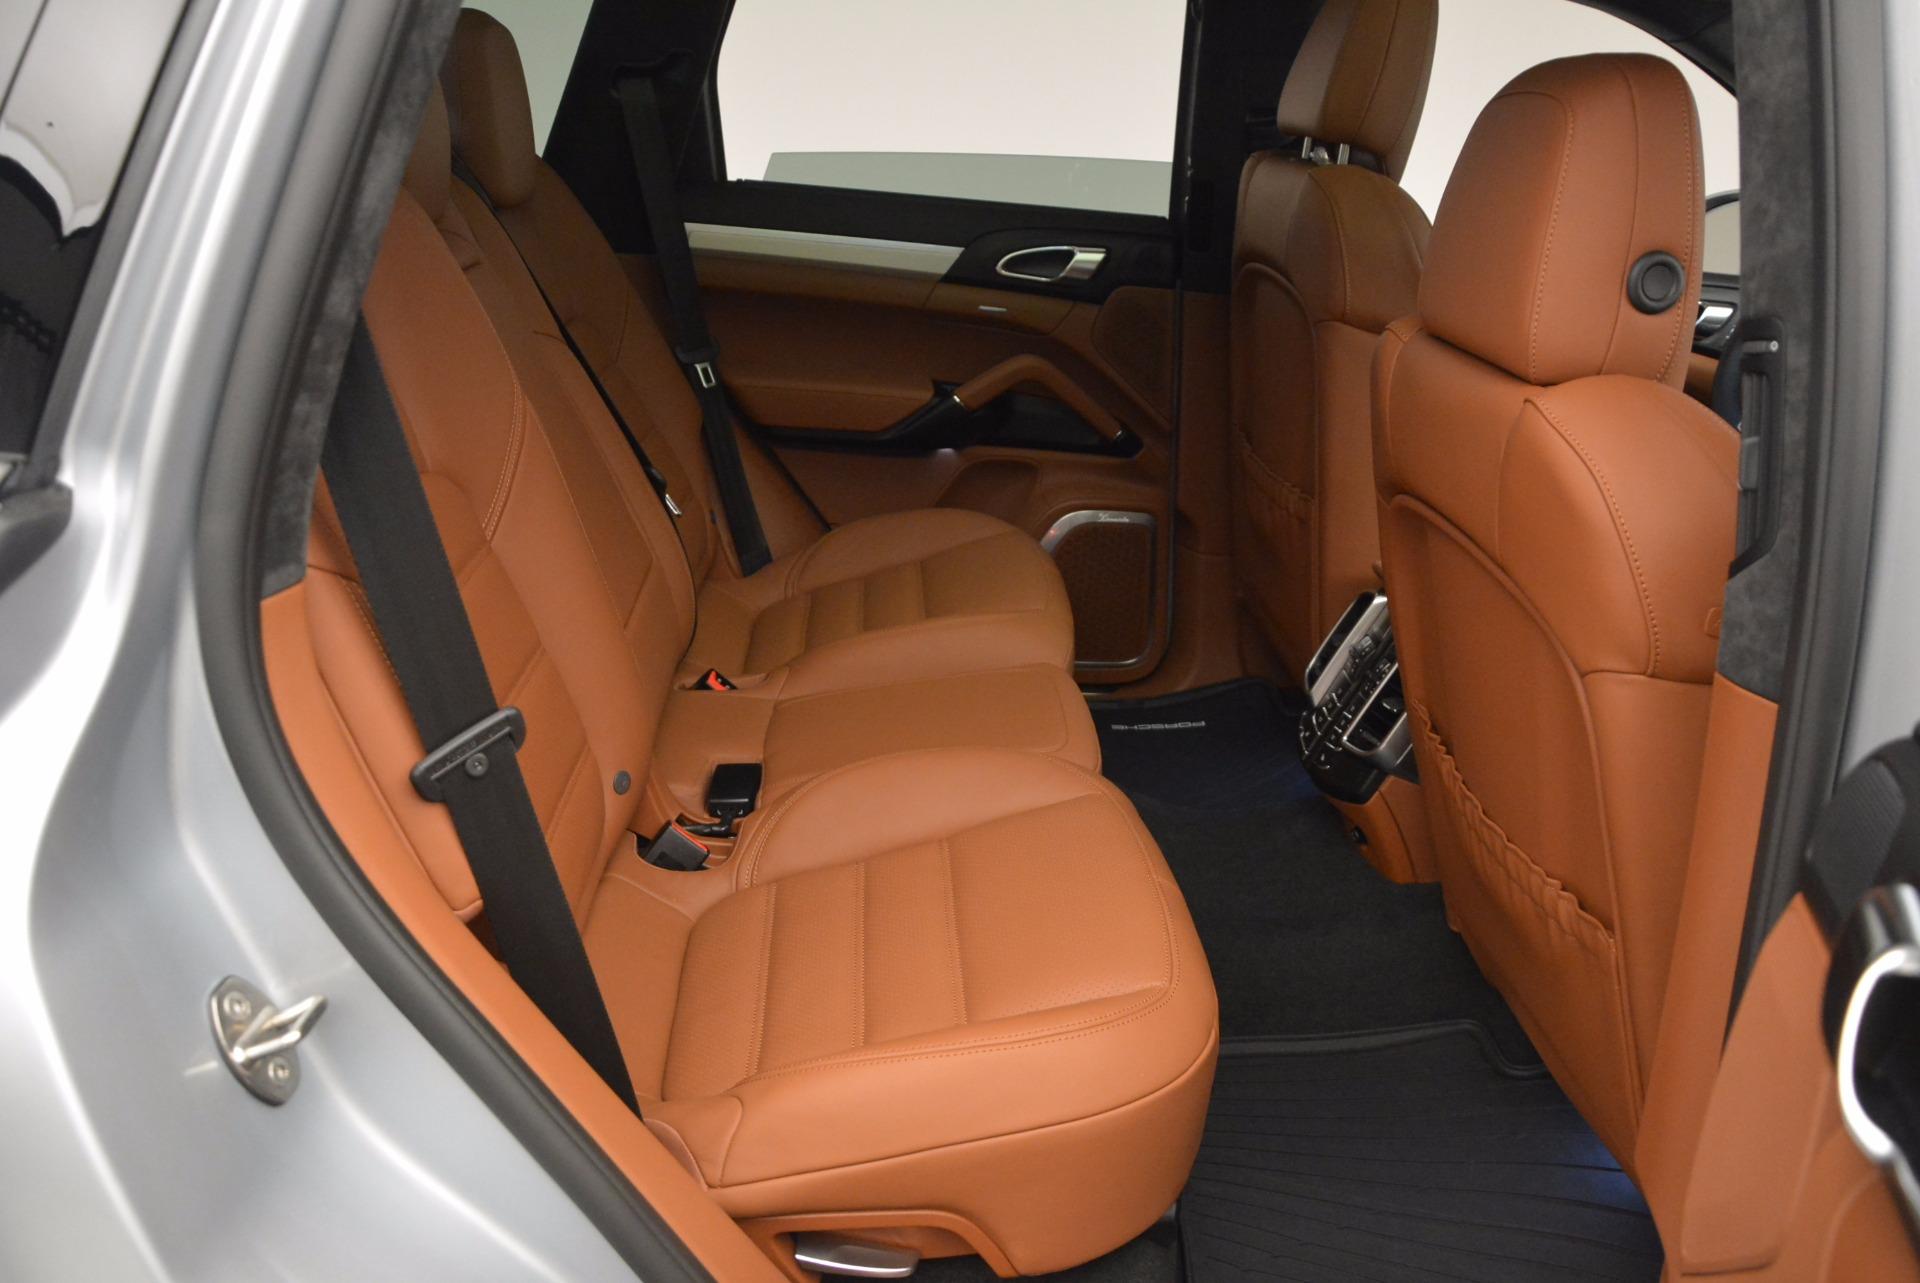 Used 2016 Porsche Cayenne Turbo For Sale In Greenwich, CT. Alfa Romeo of Greenwich, 7165 1000_p36